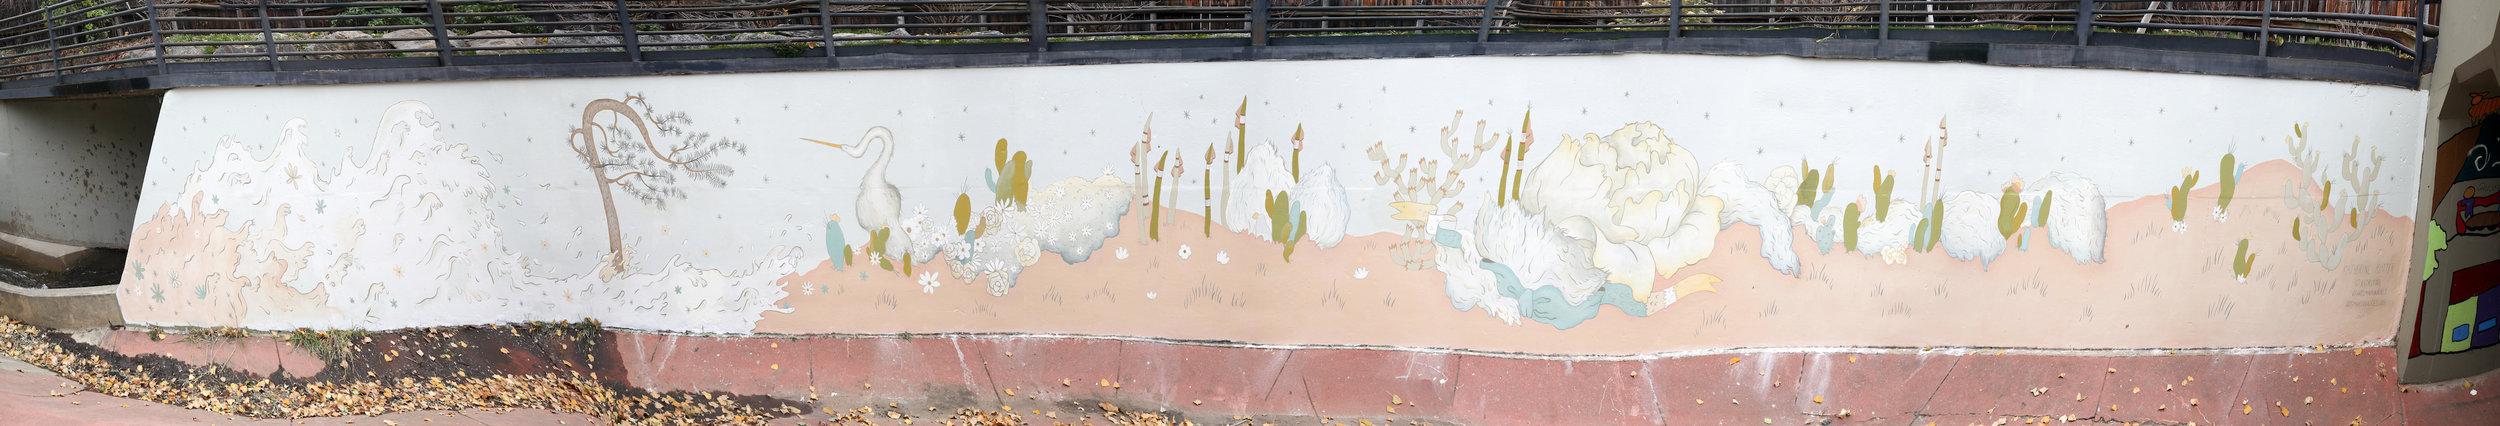 "Katerhine Rutter ""Wave Cloud"" mural @ Martin Drive on the Bear Creek Path. 2017 Boulder, CO"